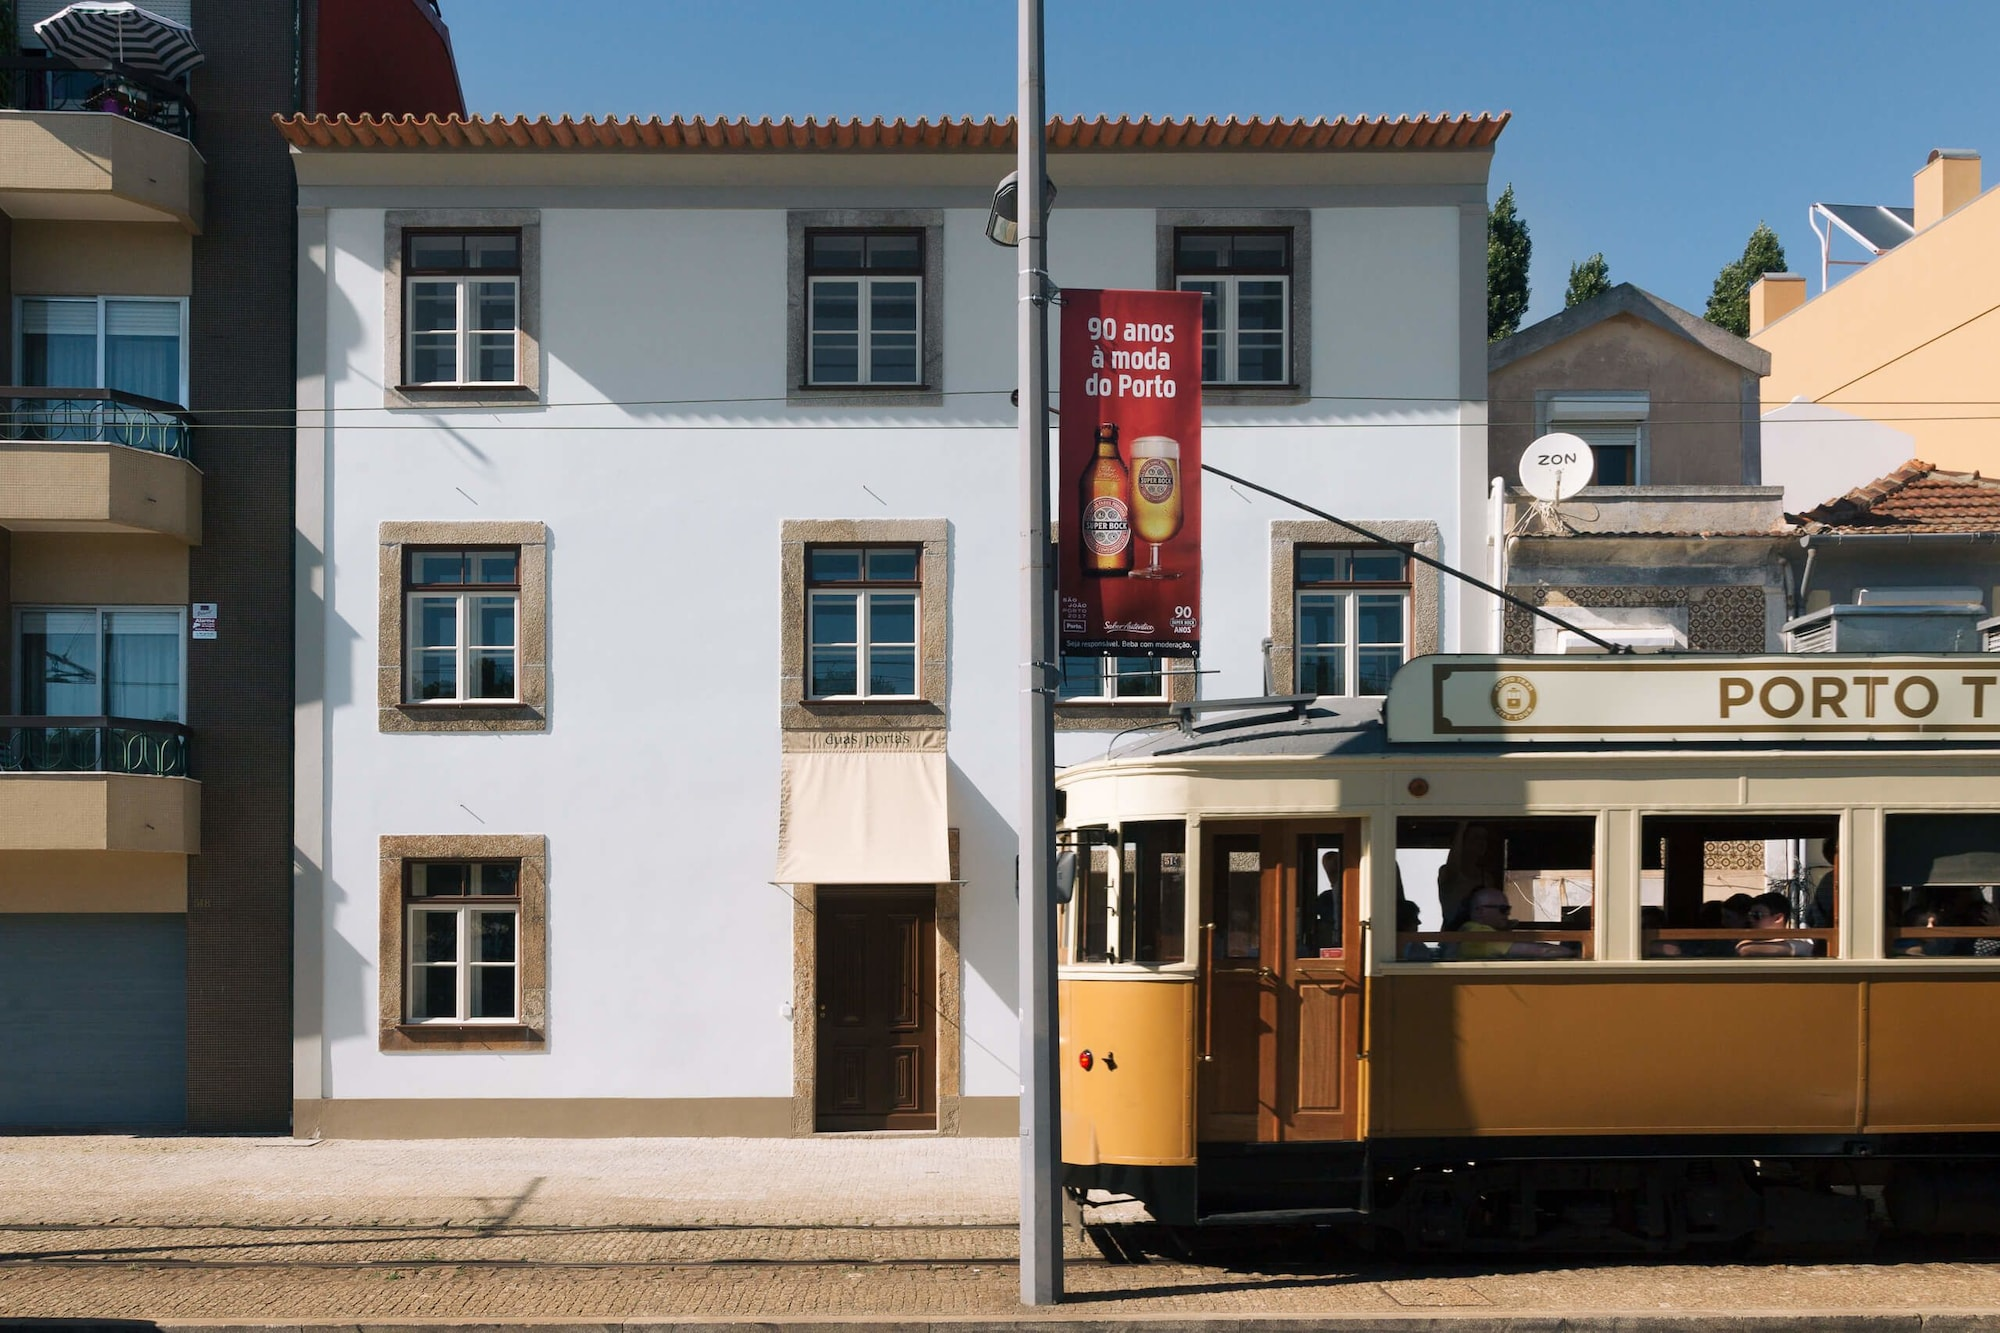 Duas Portas Townhouse, Porto